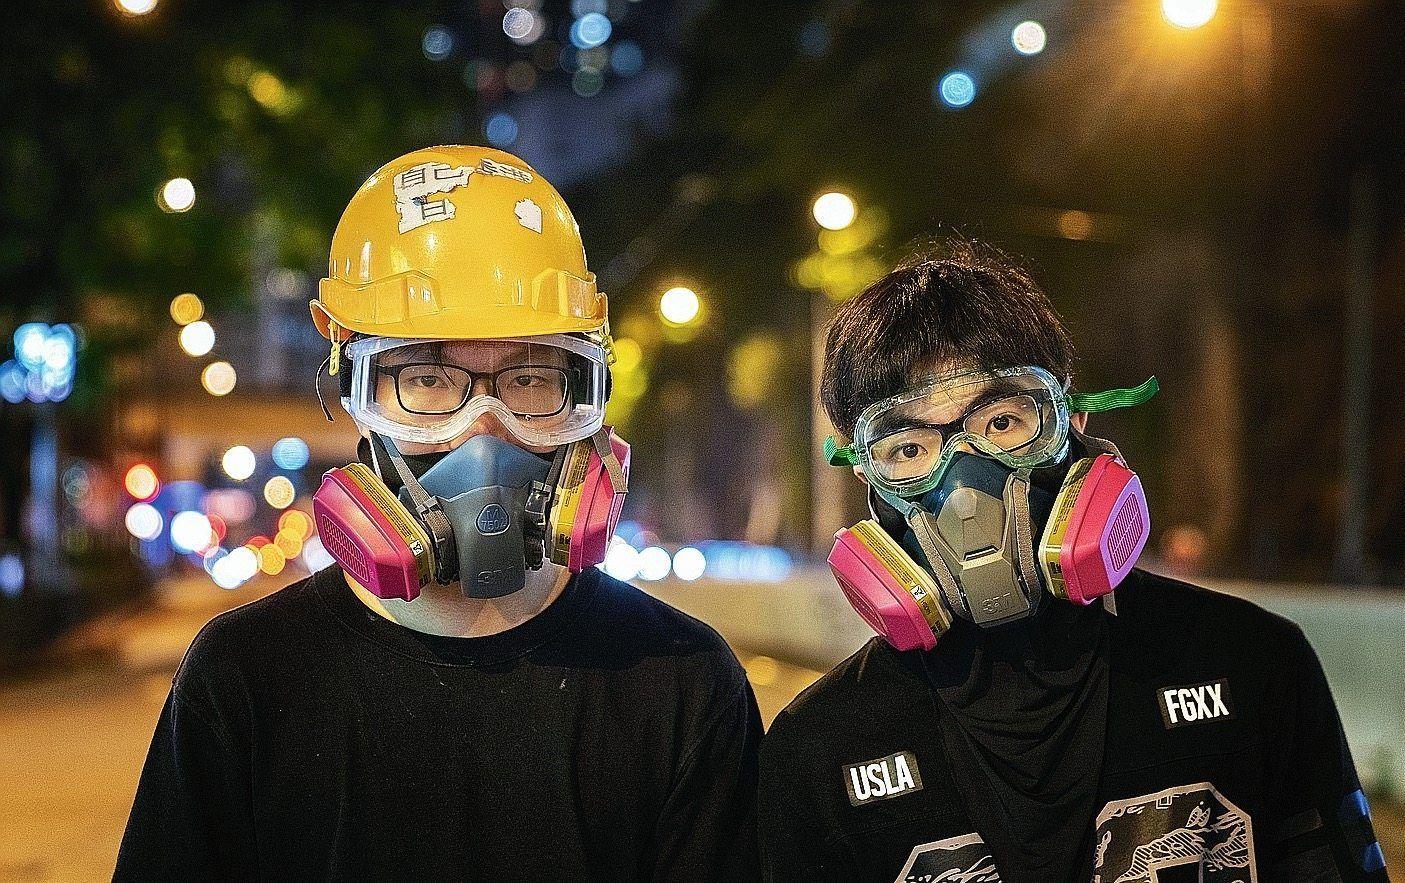 EINMALIGE VERWENDUNG SPIN SP 40 / 2019 S. 90 Hongkong